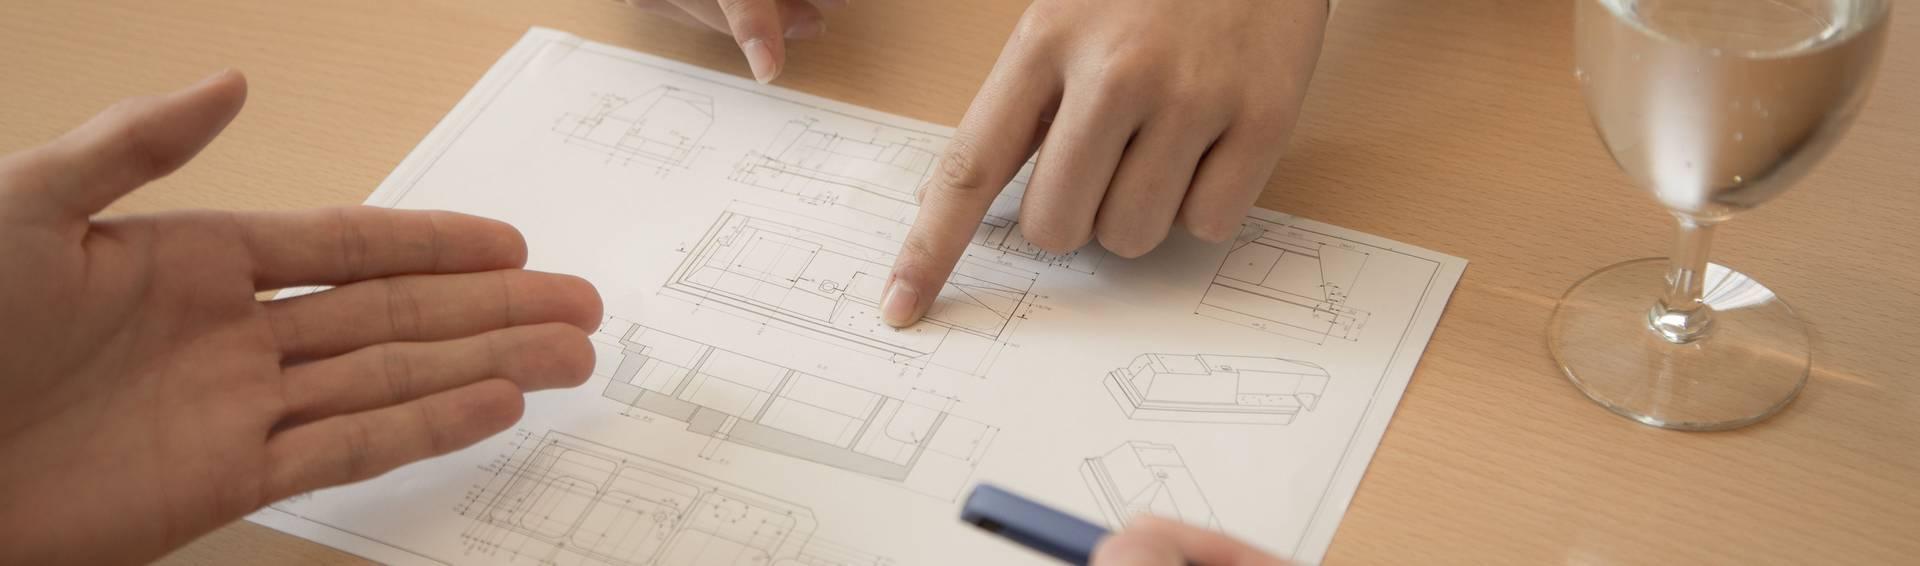 Konstrukteur/in EFZ: Beispielprojekt